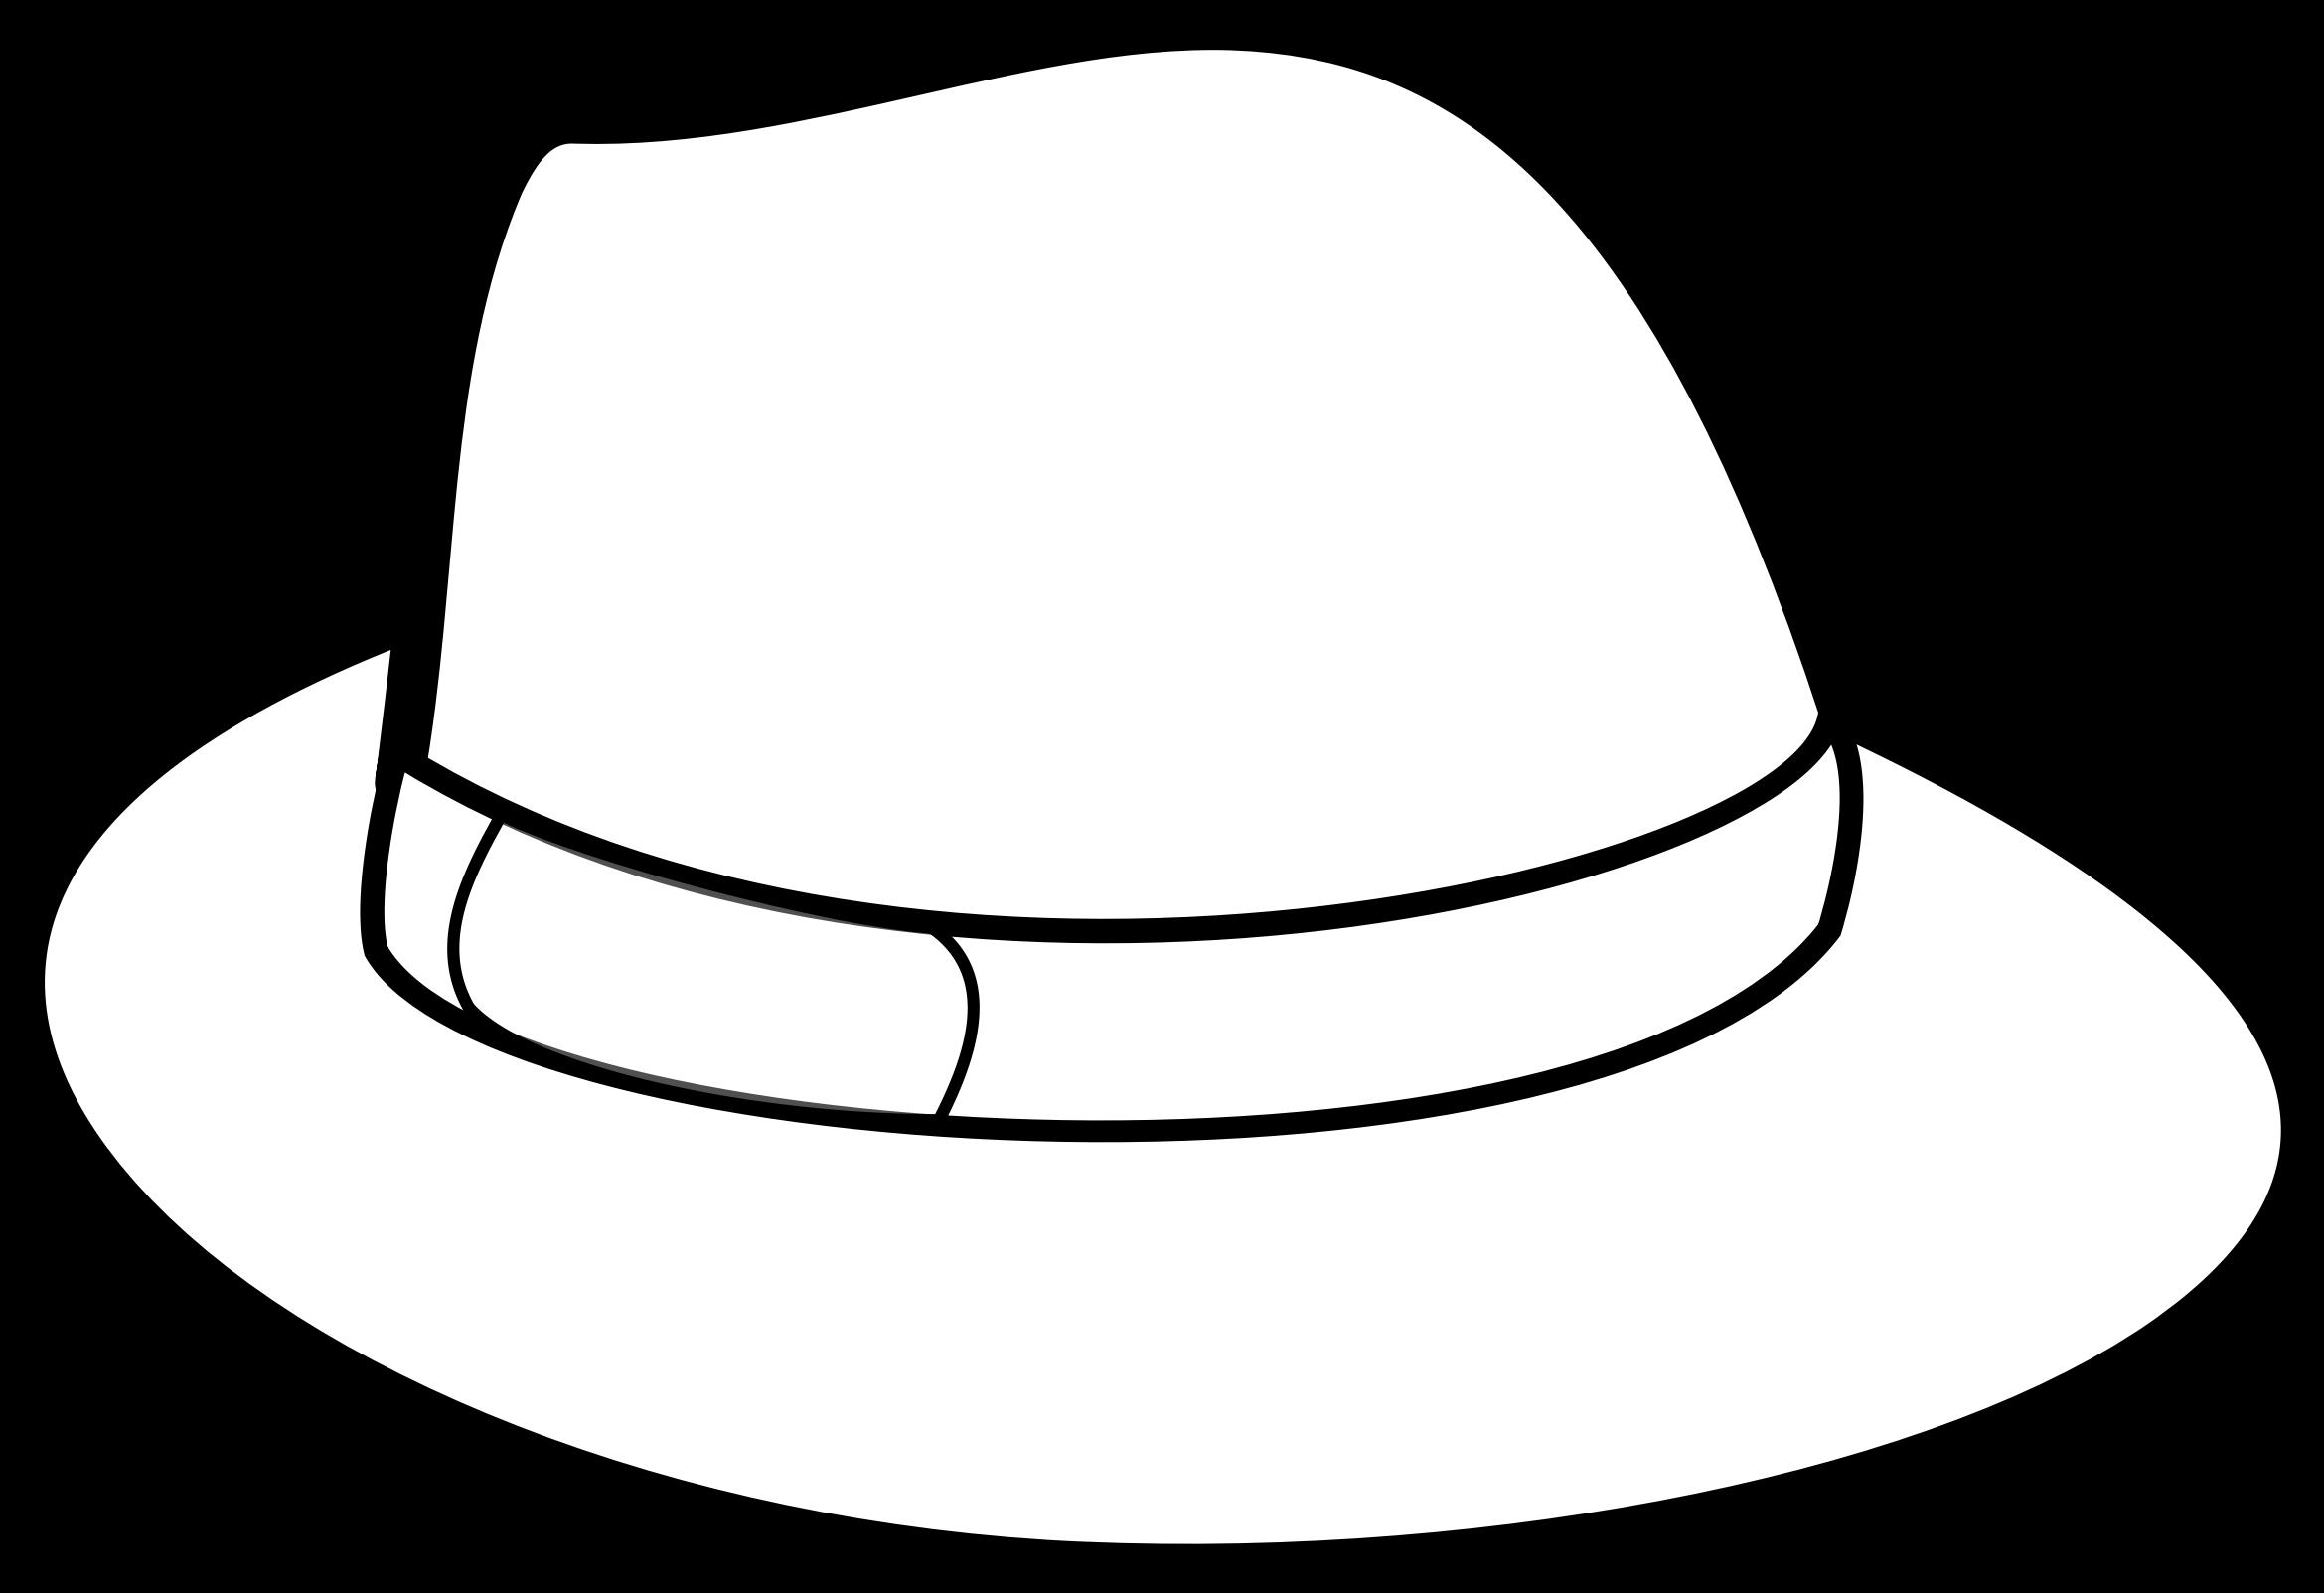 Black and white cartoon baseball cap clipart jpg royalty free library Cartoon Hat (54+) jpg royalty free library